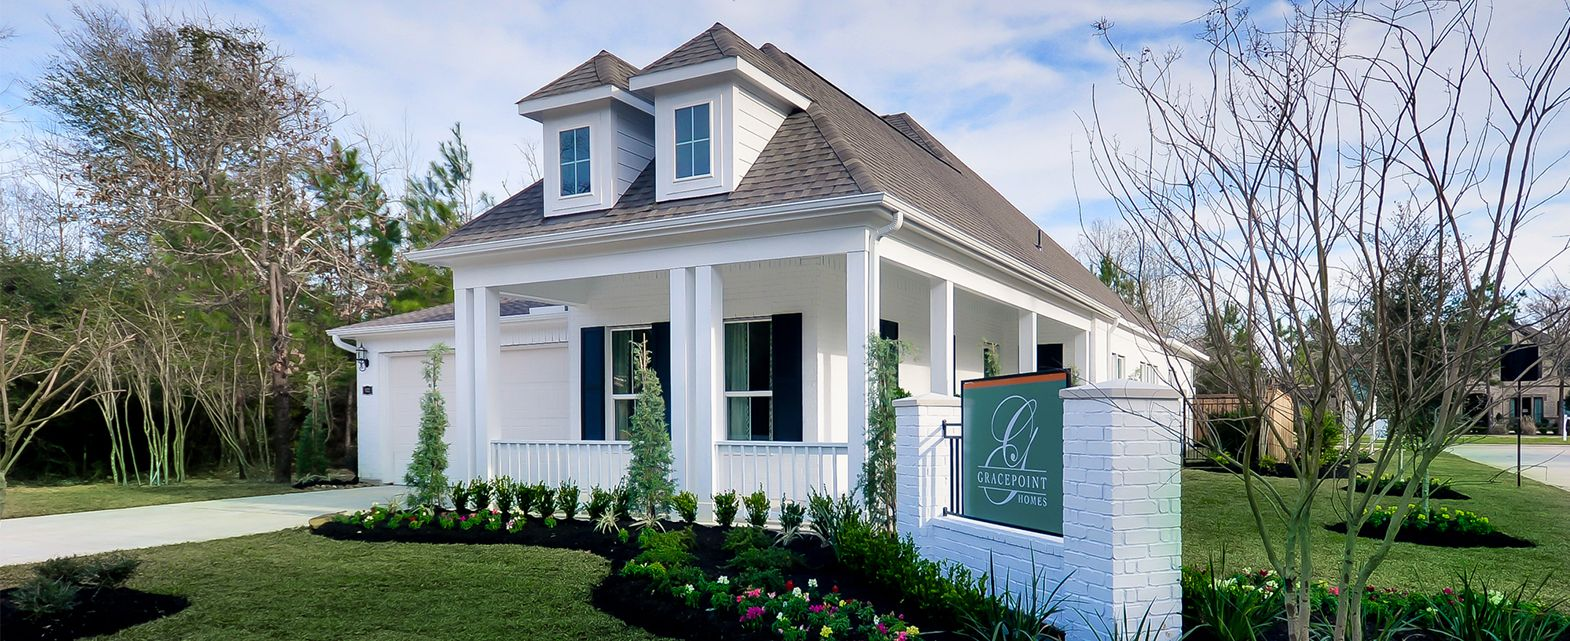 gracepoint homes houston tx communities u0026 homes for sale